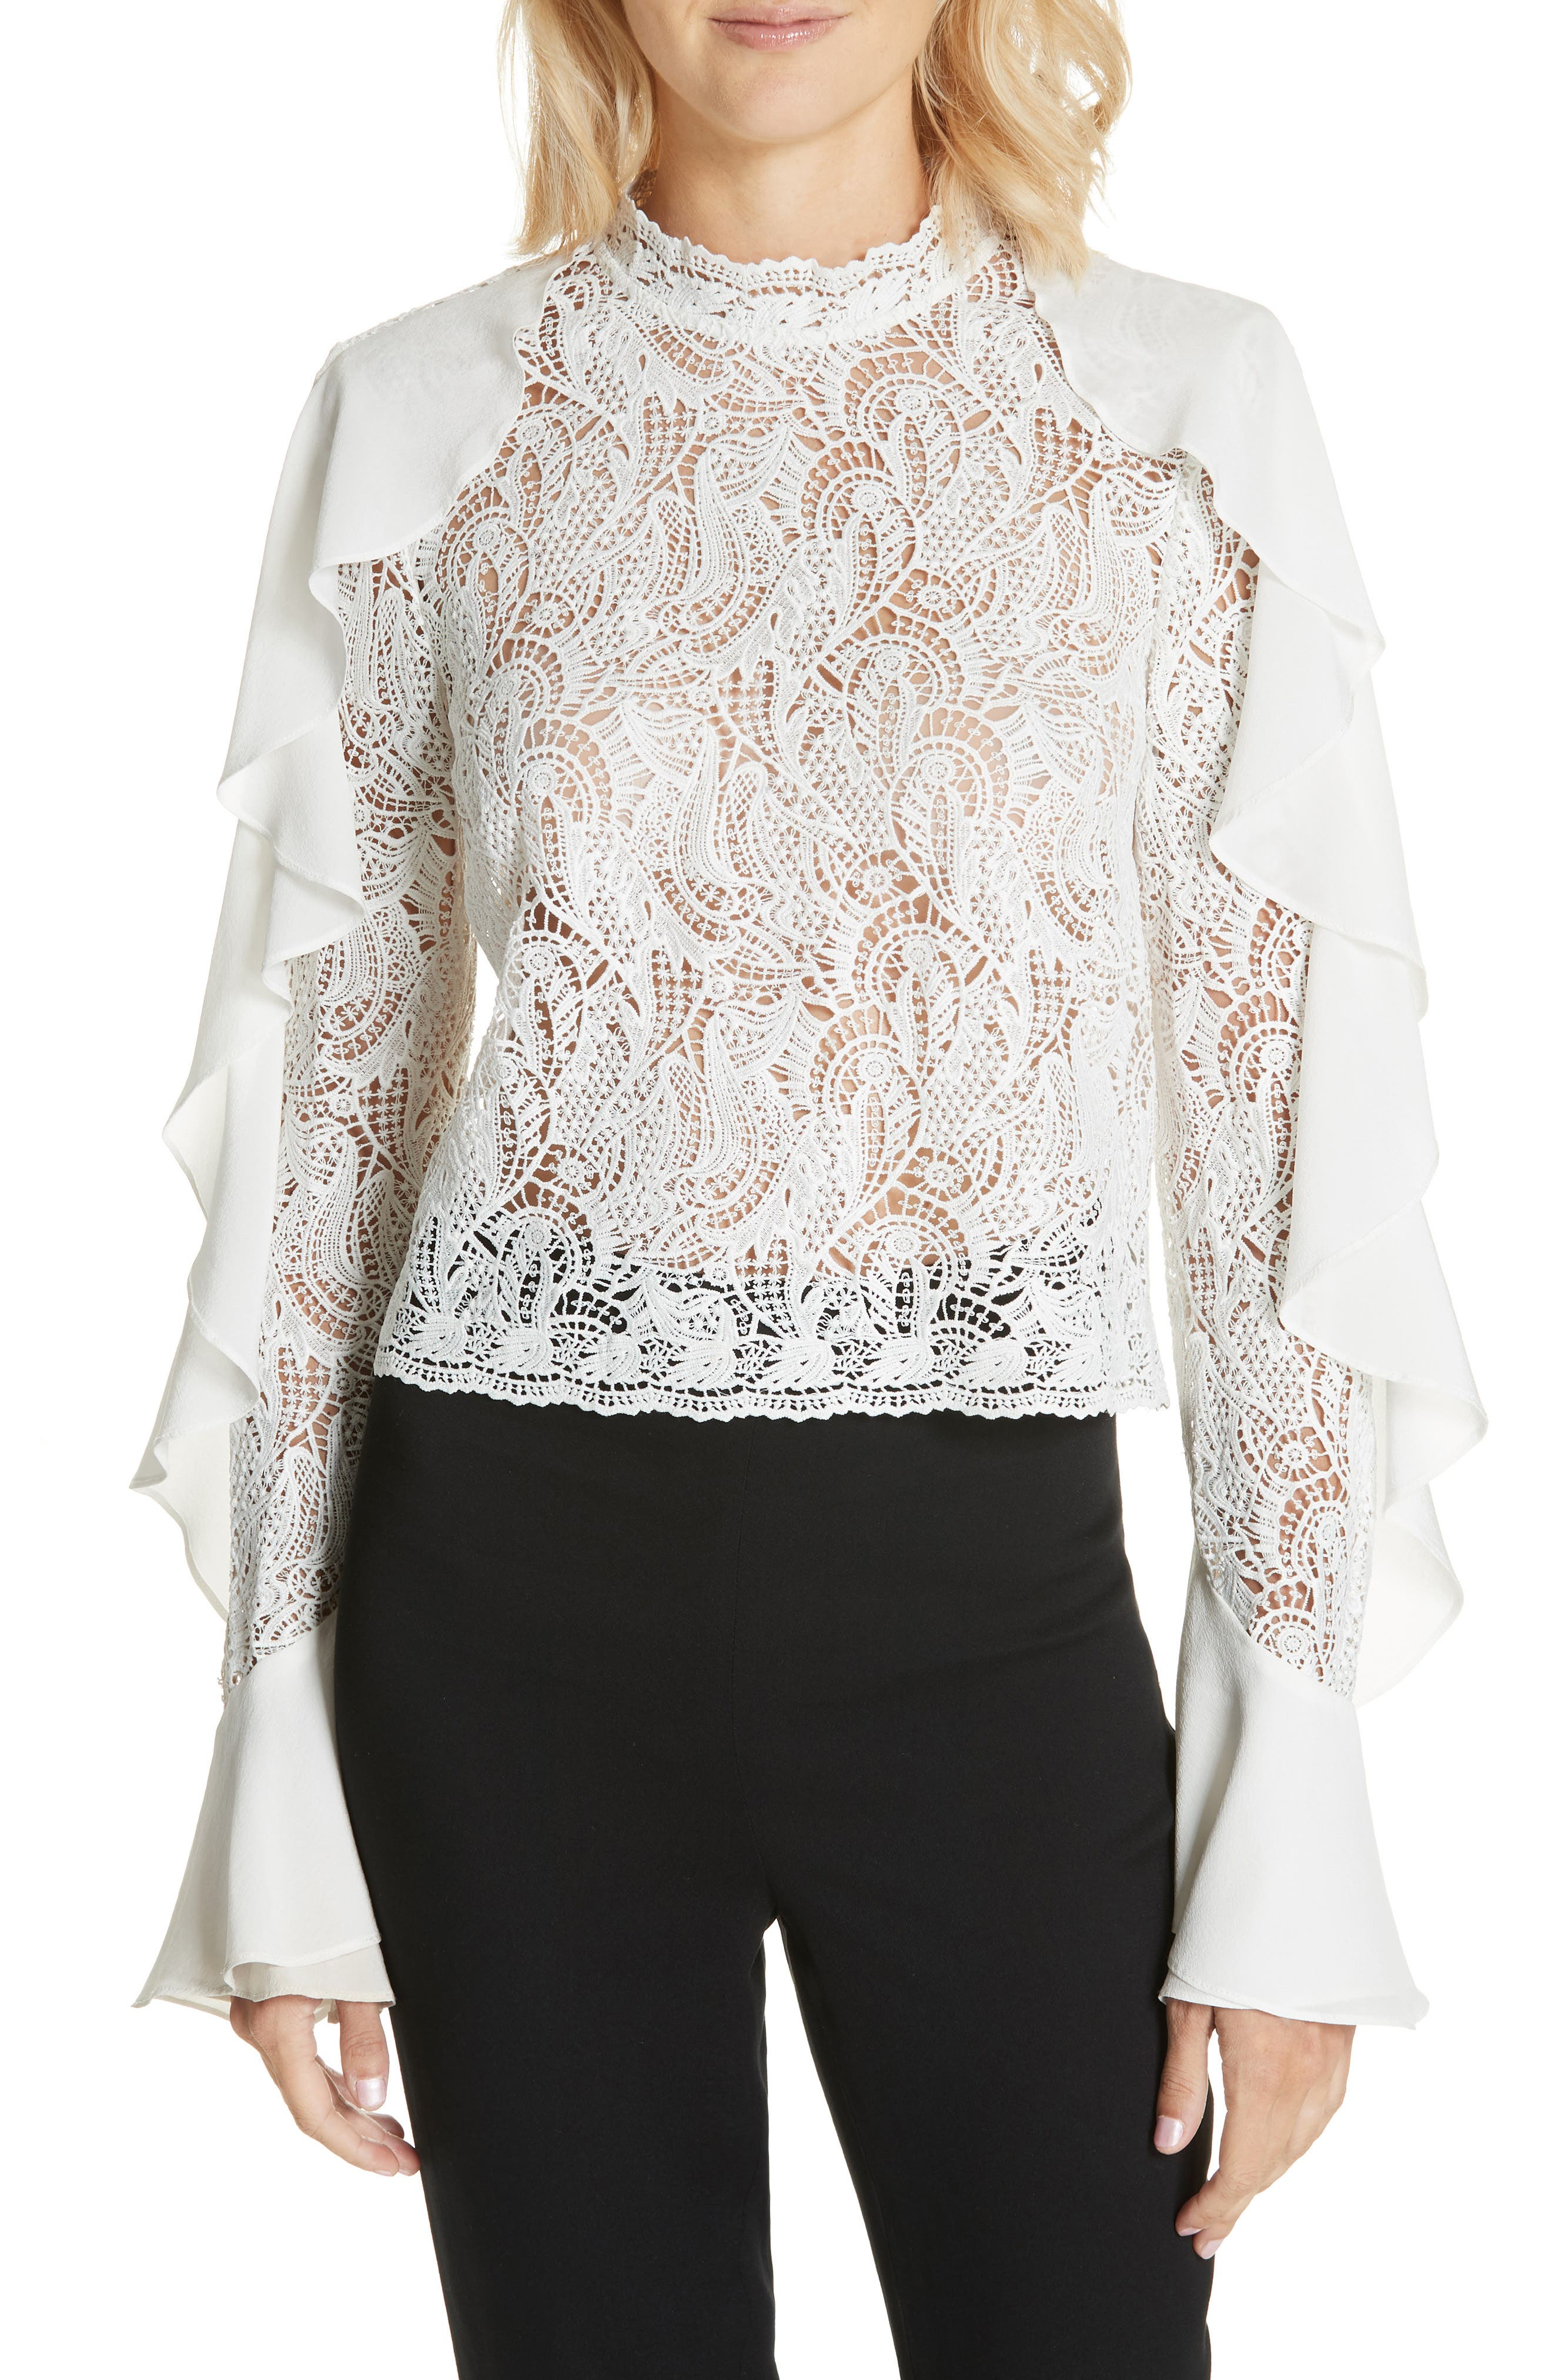 AMUR Ilana Crop Ruffle & Lace Top in White